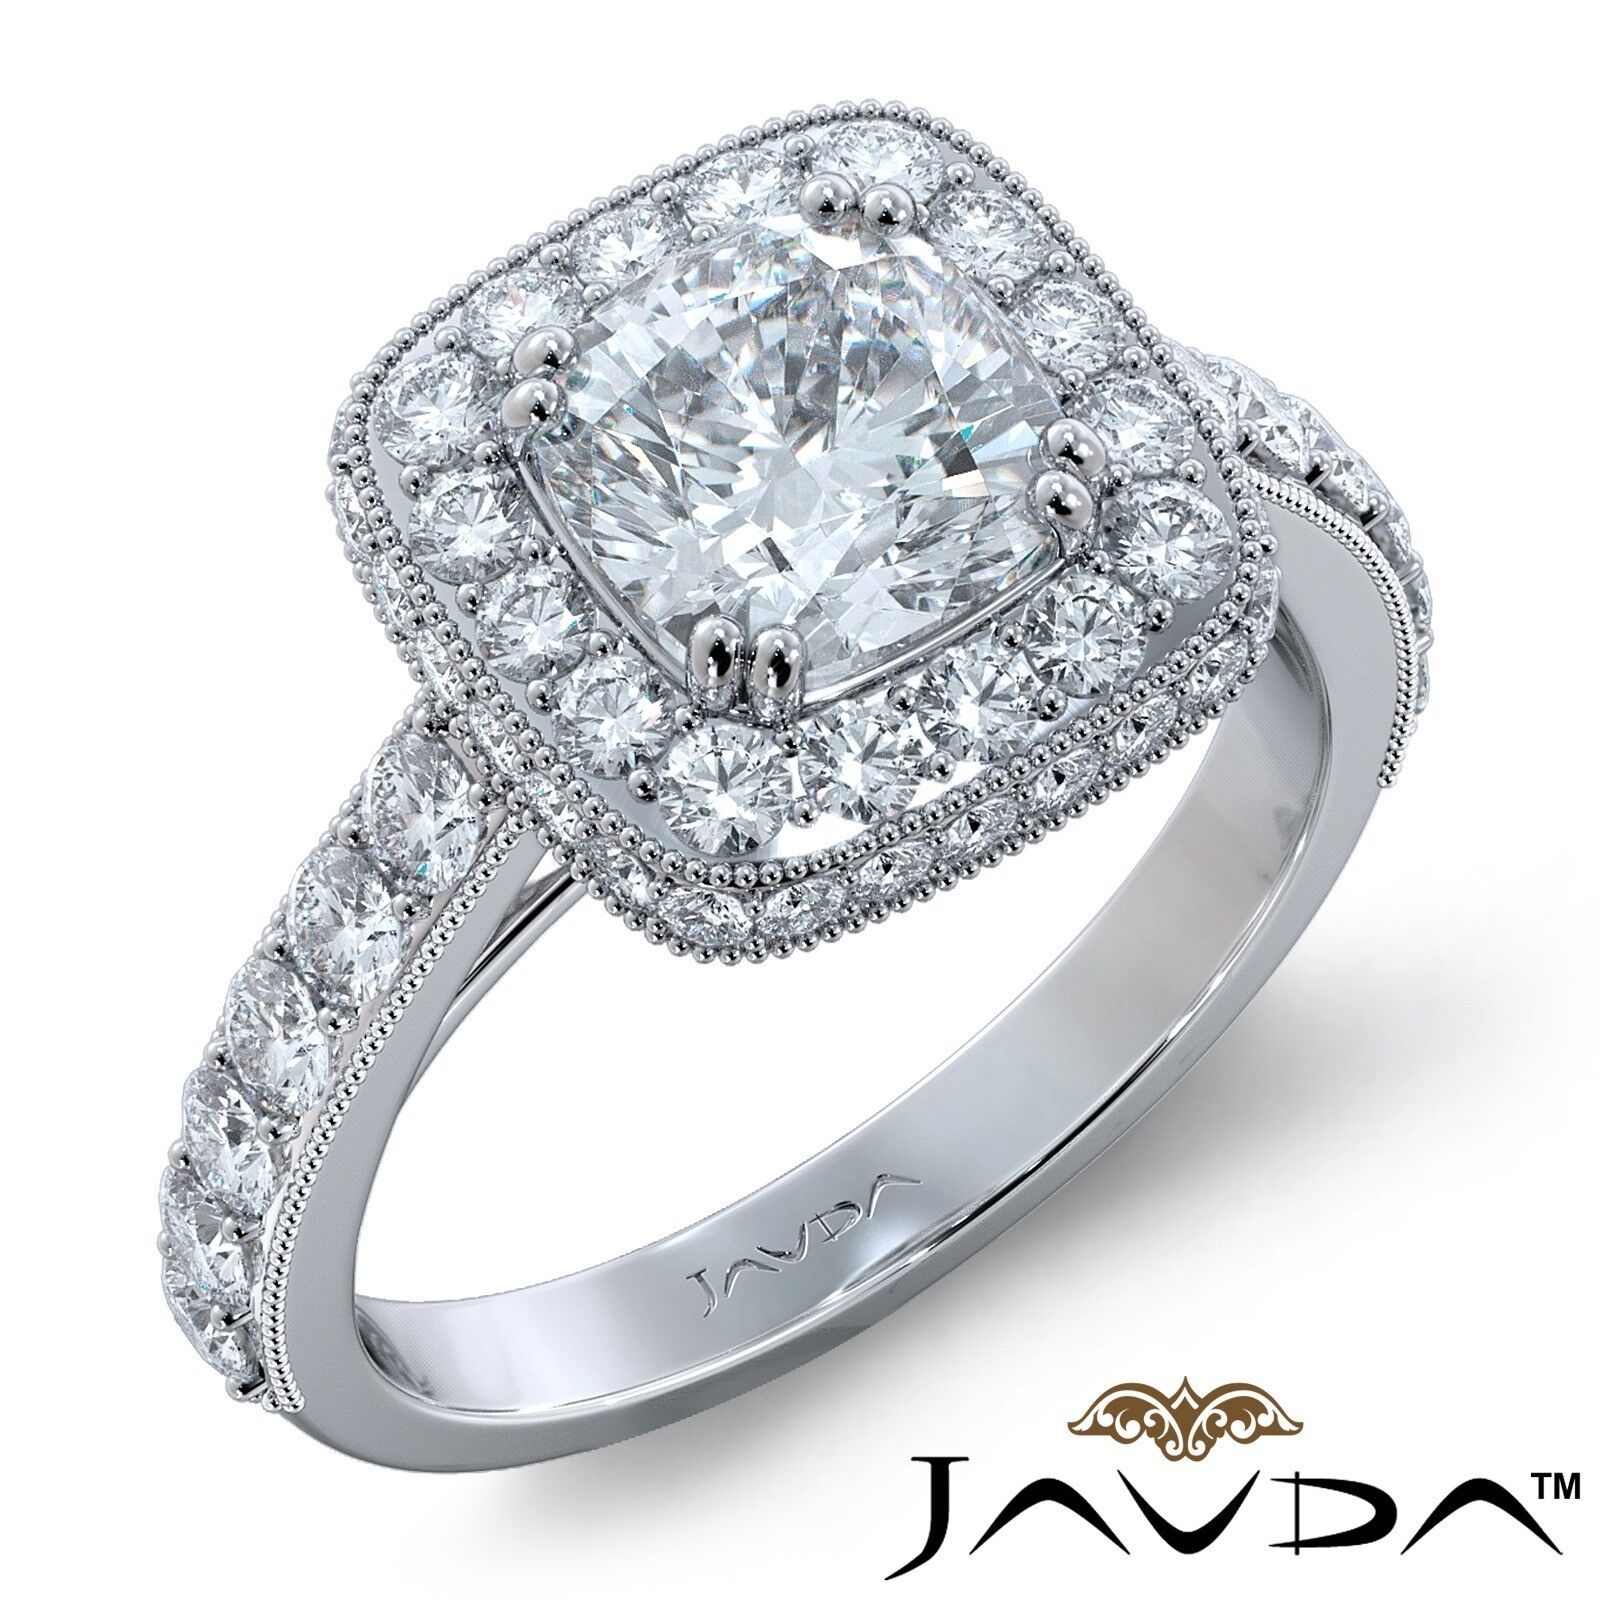 2ctw Milgrain Halo Floral Basket Cushion Diamond Engagement Ring GIA H-VS2 Gold